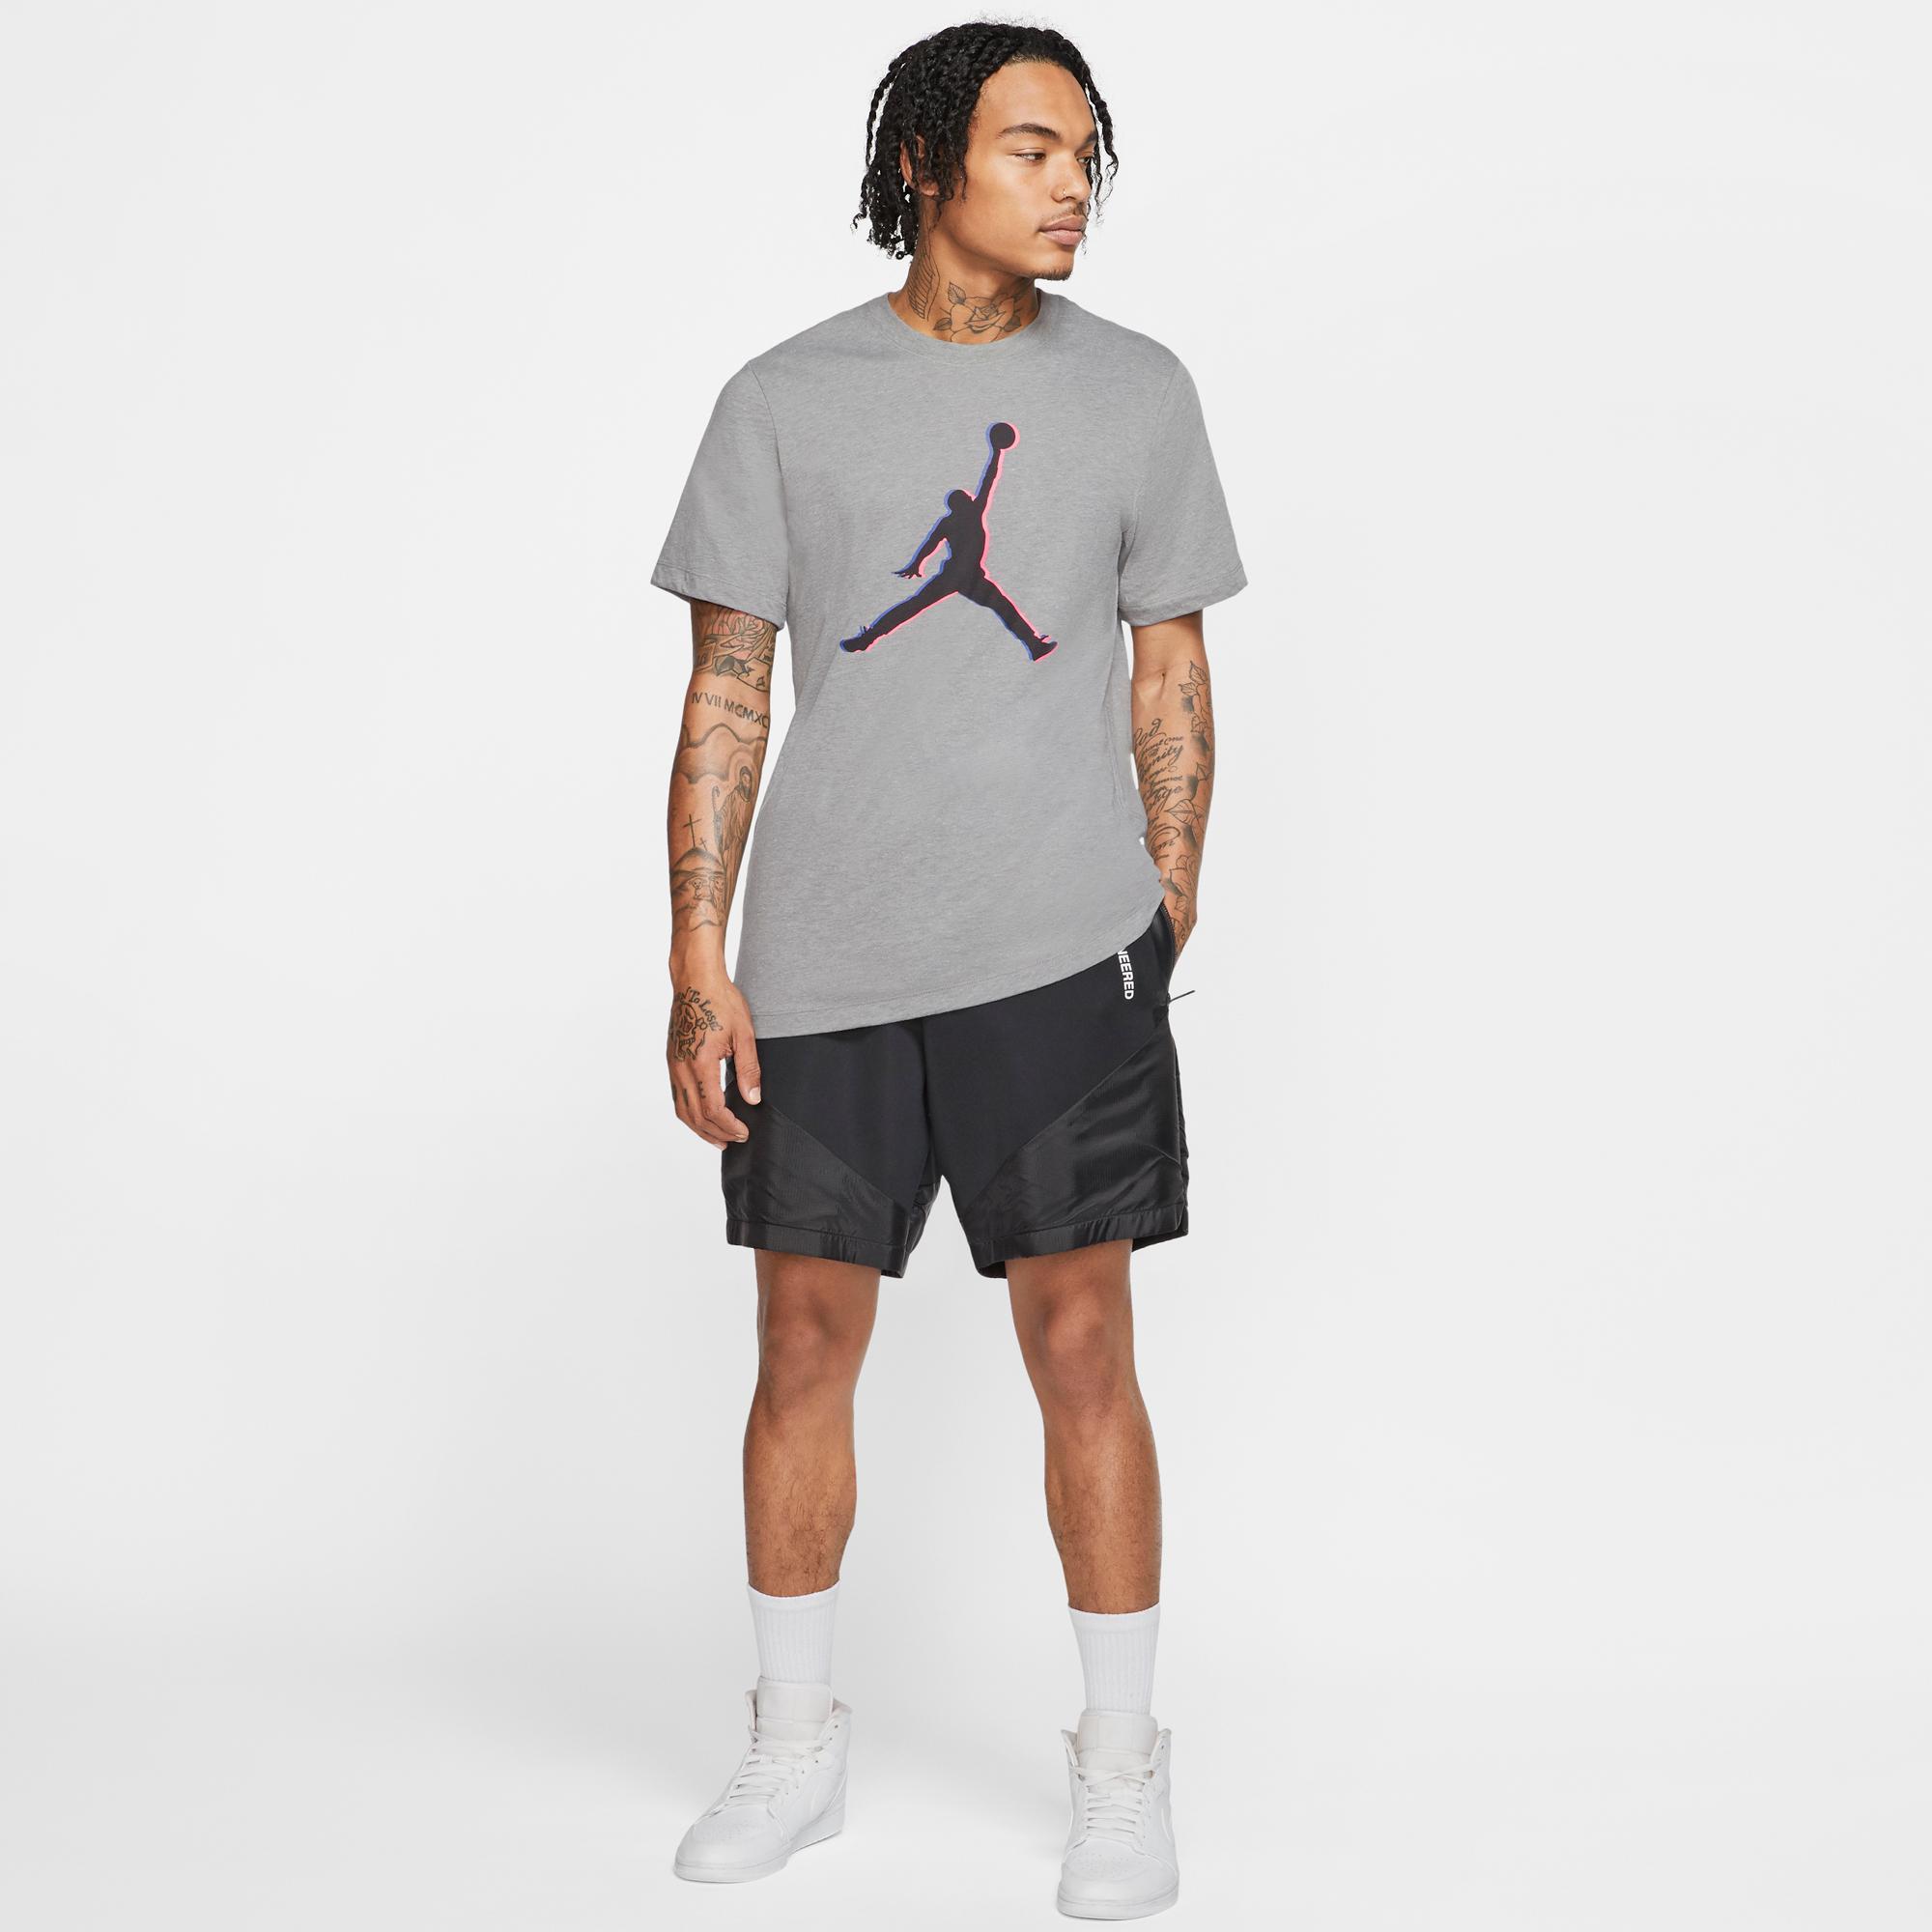 shirt for men and women